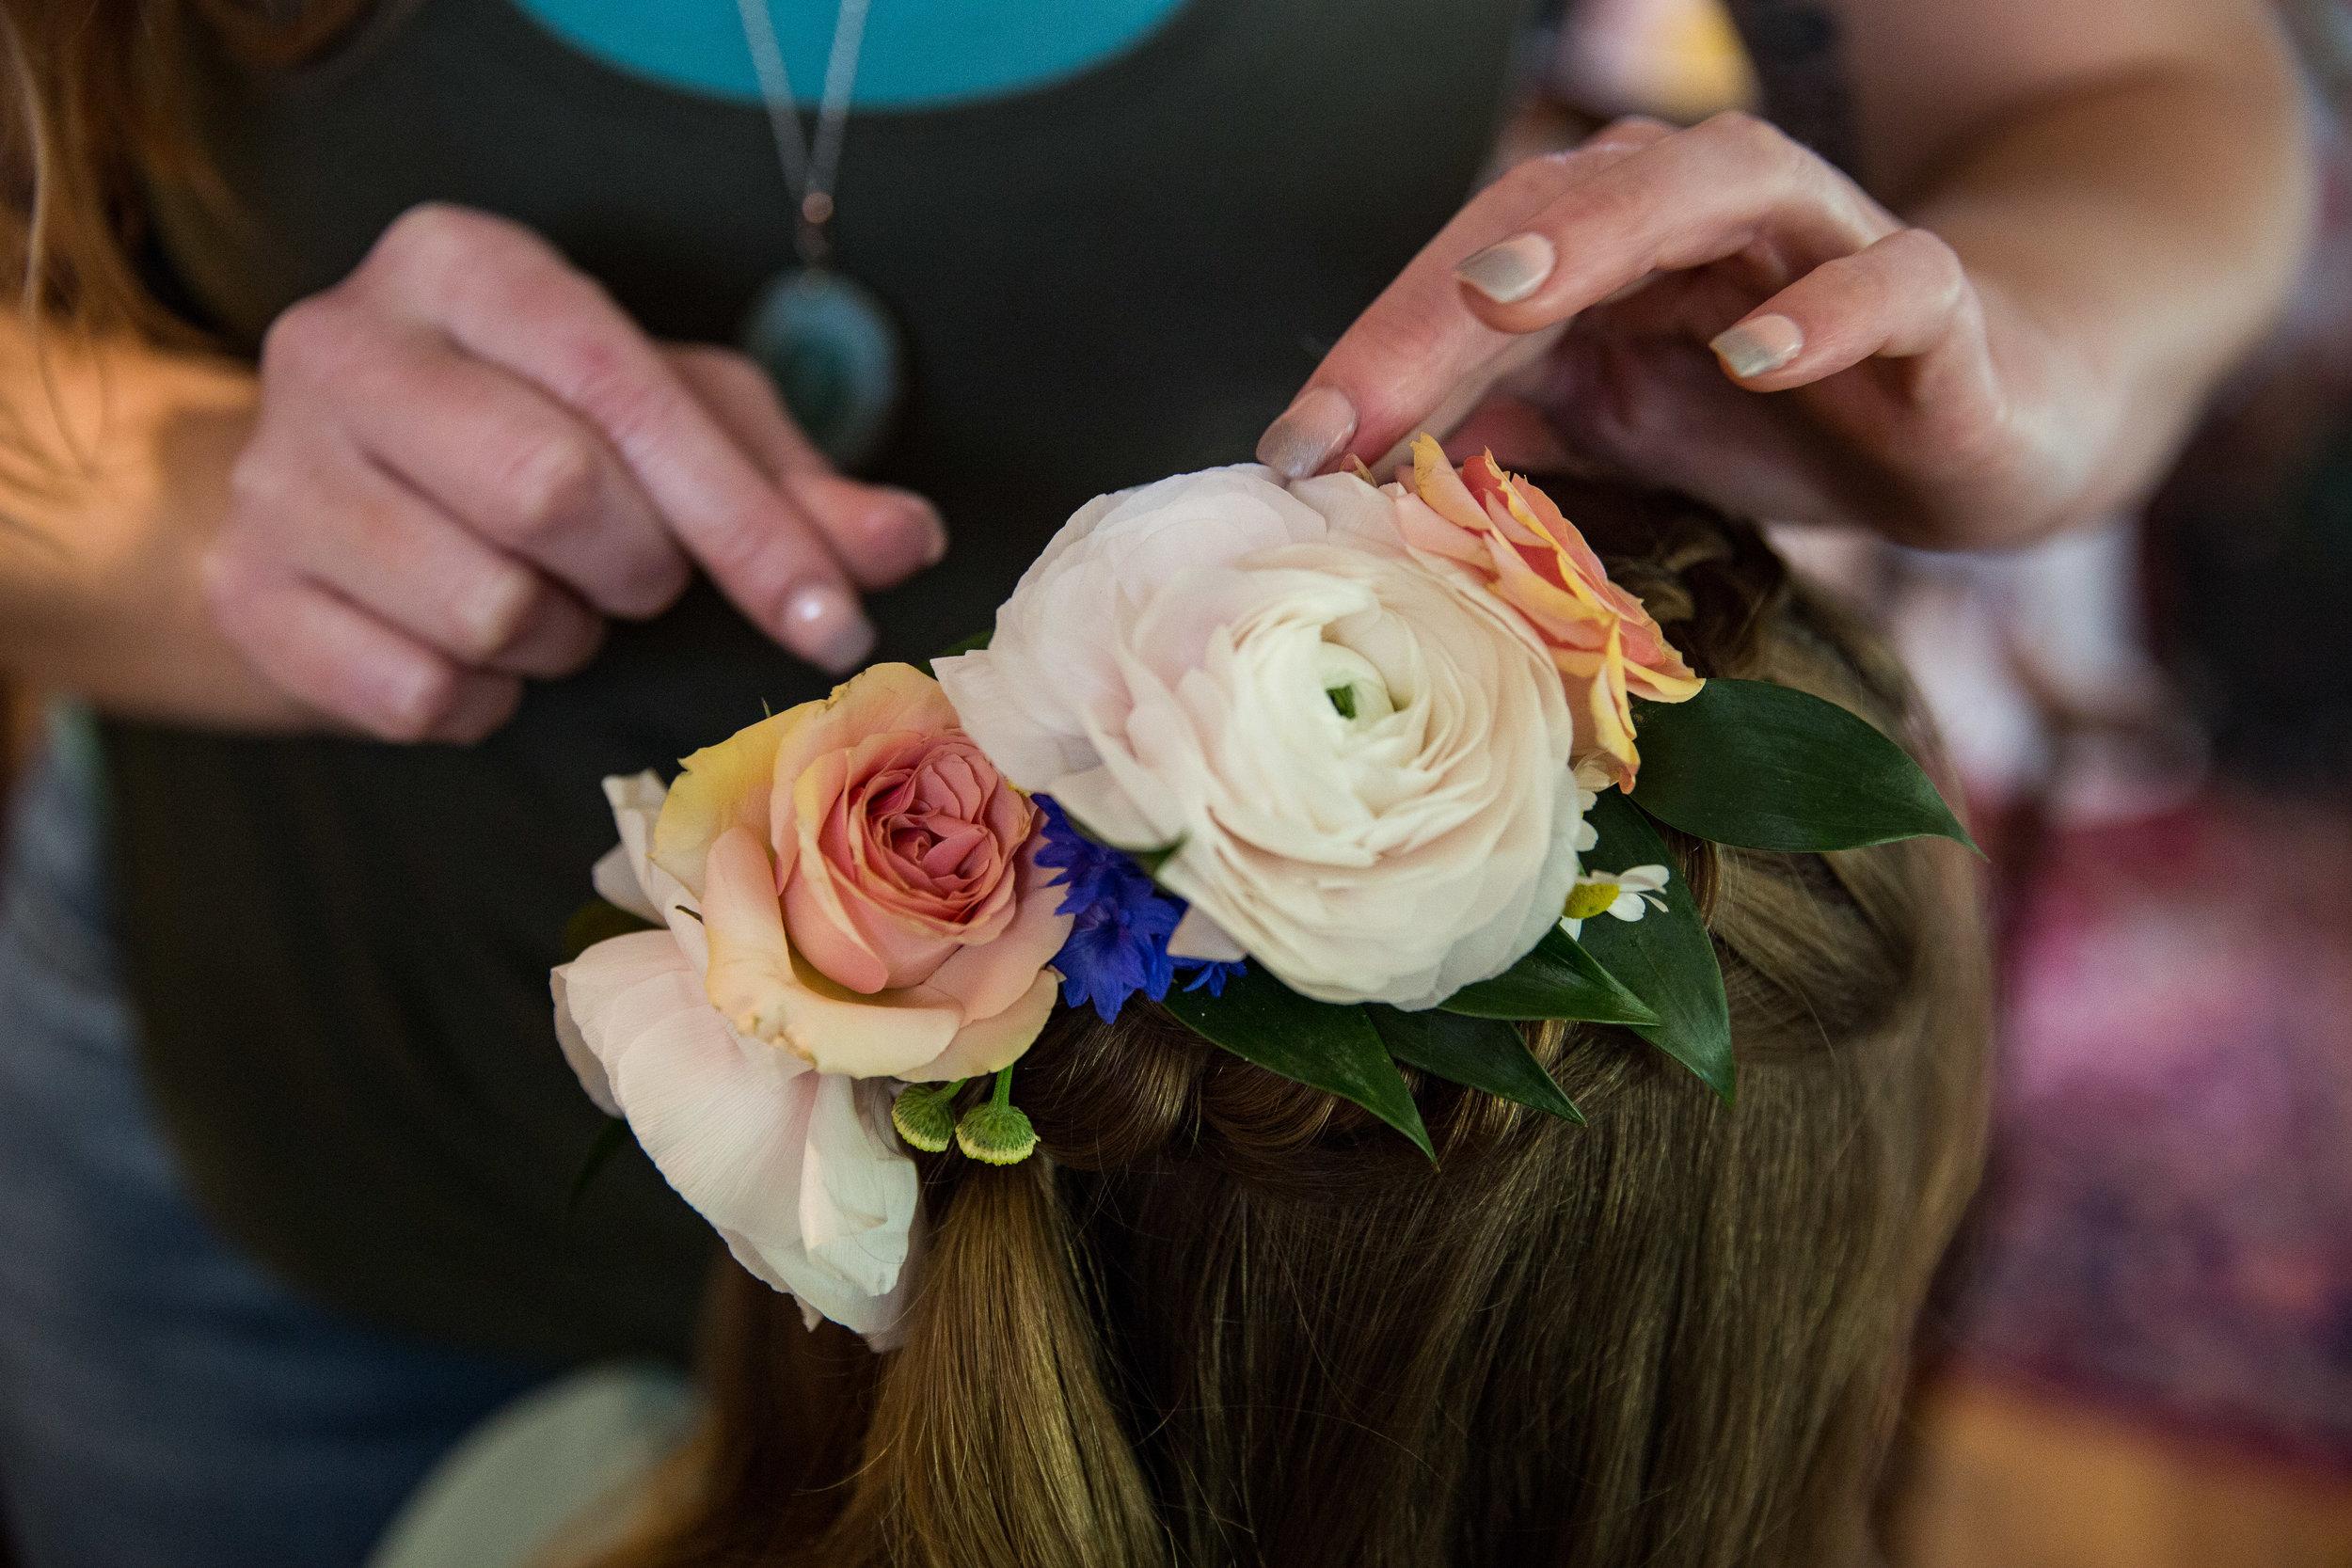 Natalie and Dallas Mooney Wedding 6-8-19_Tania Watt Photography-22.jpg